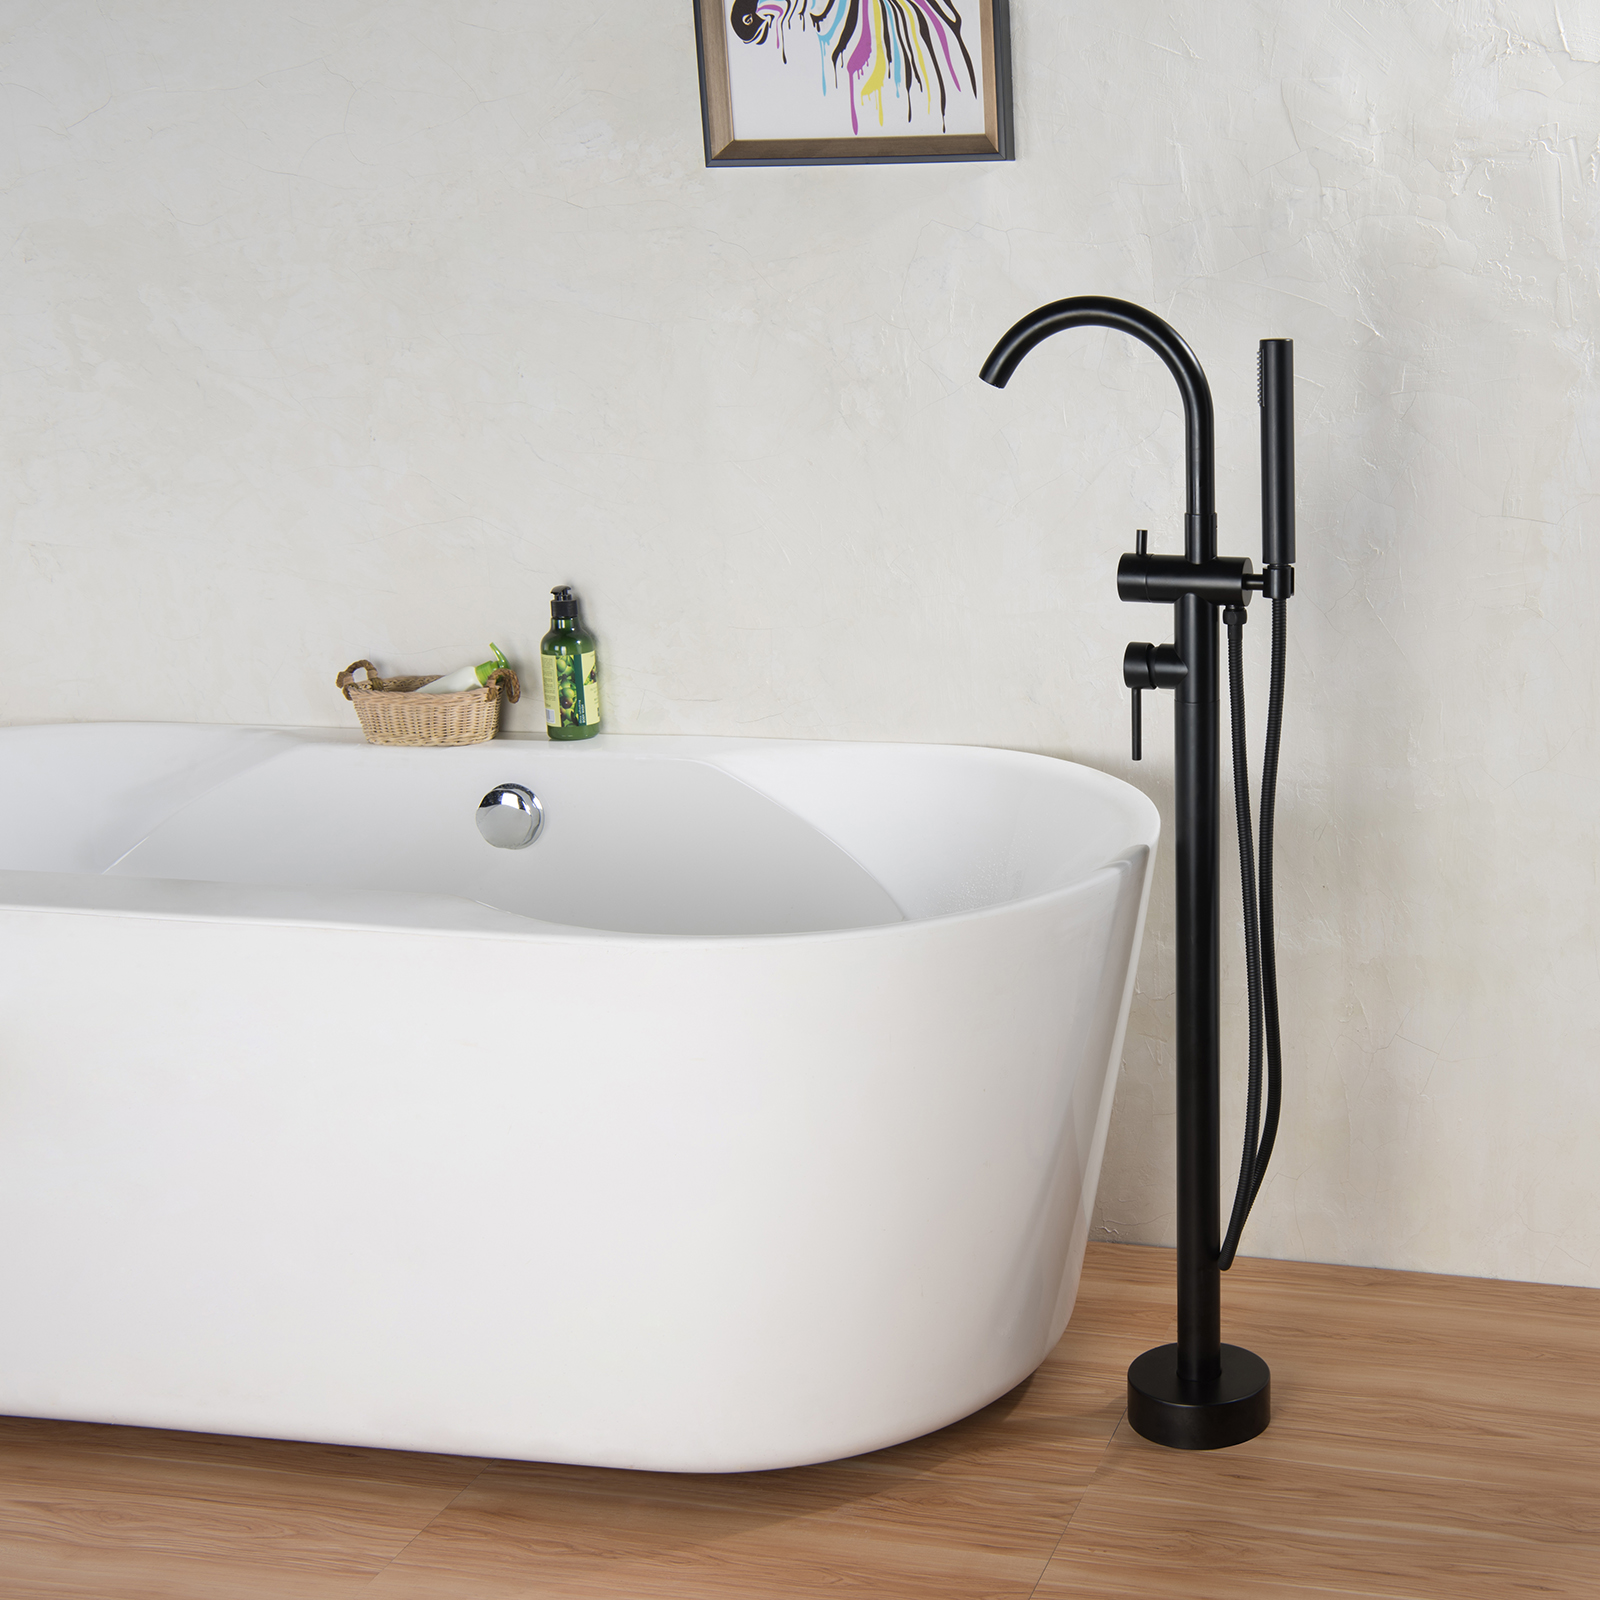 Freestanding Bath Shower Mixer Tap 8028b Black